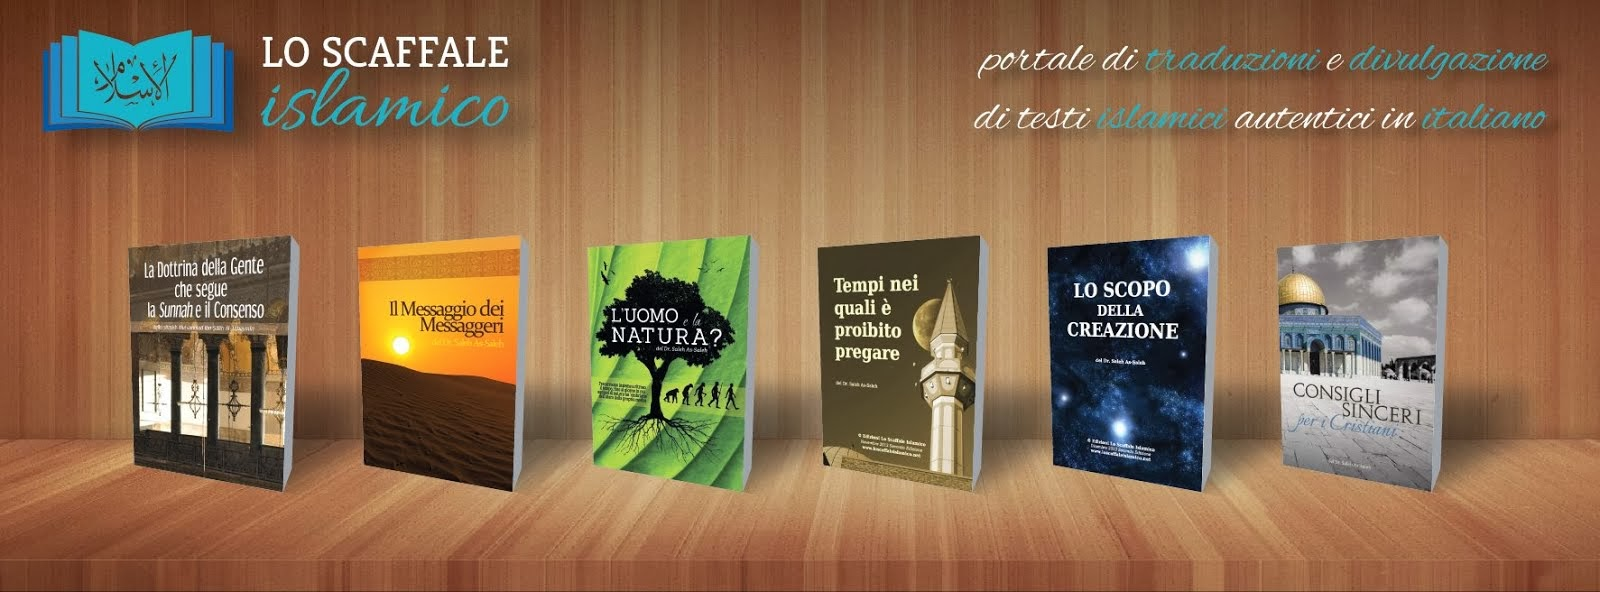 Libreria islamica online